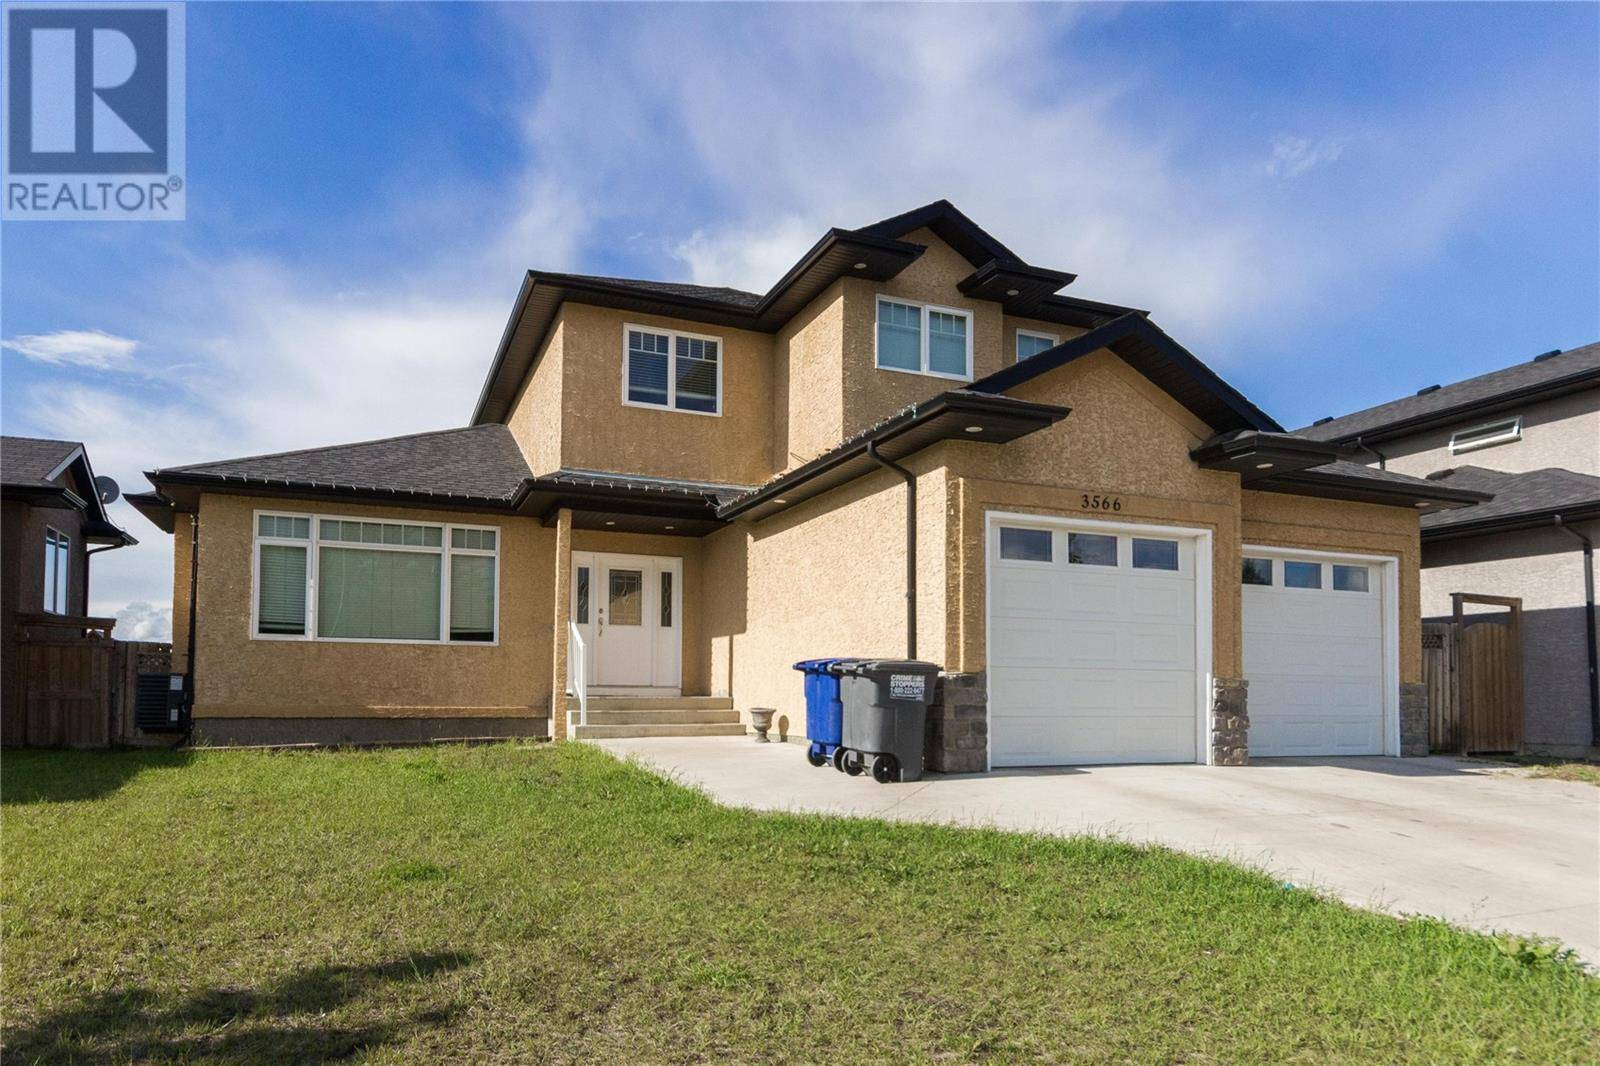 House for sale at 3566 37th St W Saskatoon Saskatchewan - MLS: SK777673